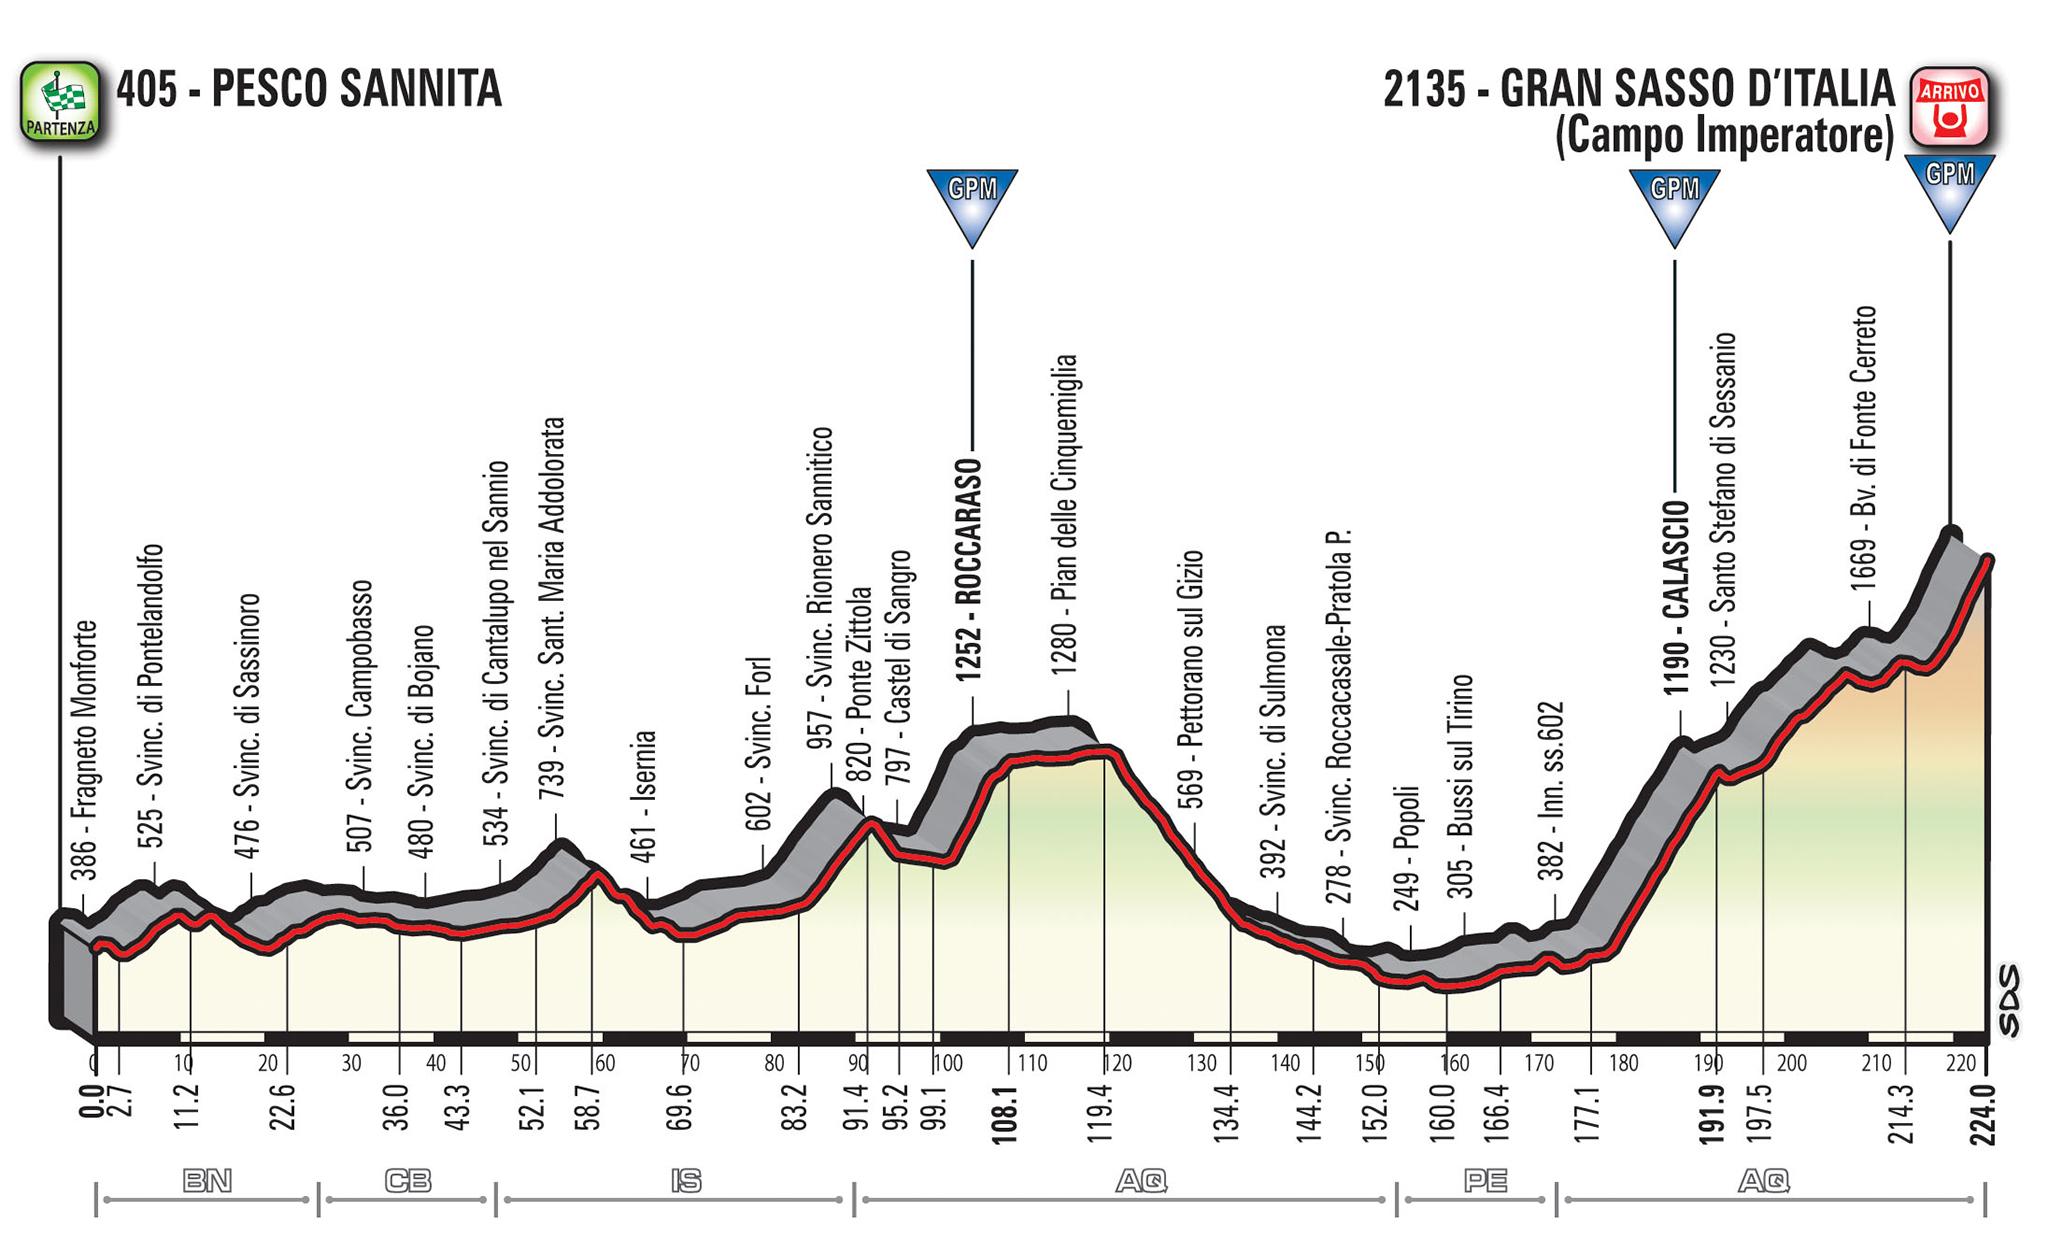 Giro d'Italia 2018, da Israele a Roma passando per Pesaro